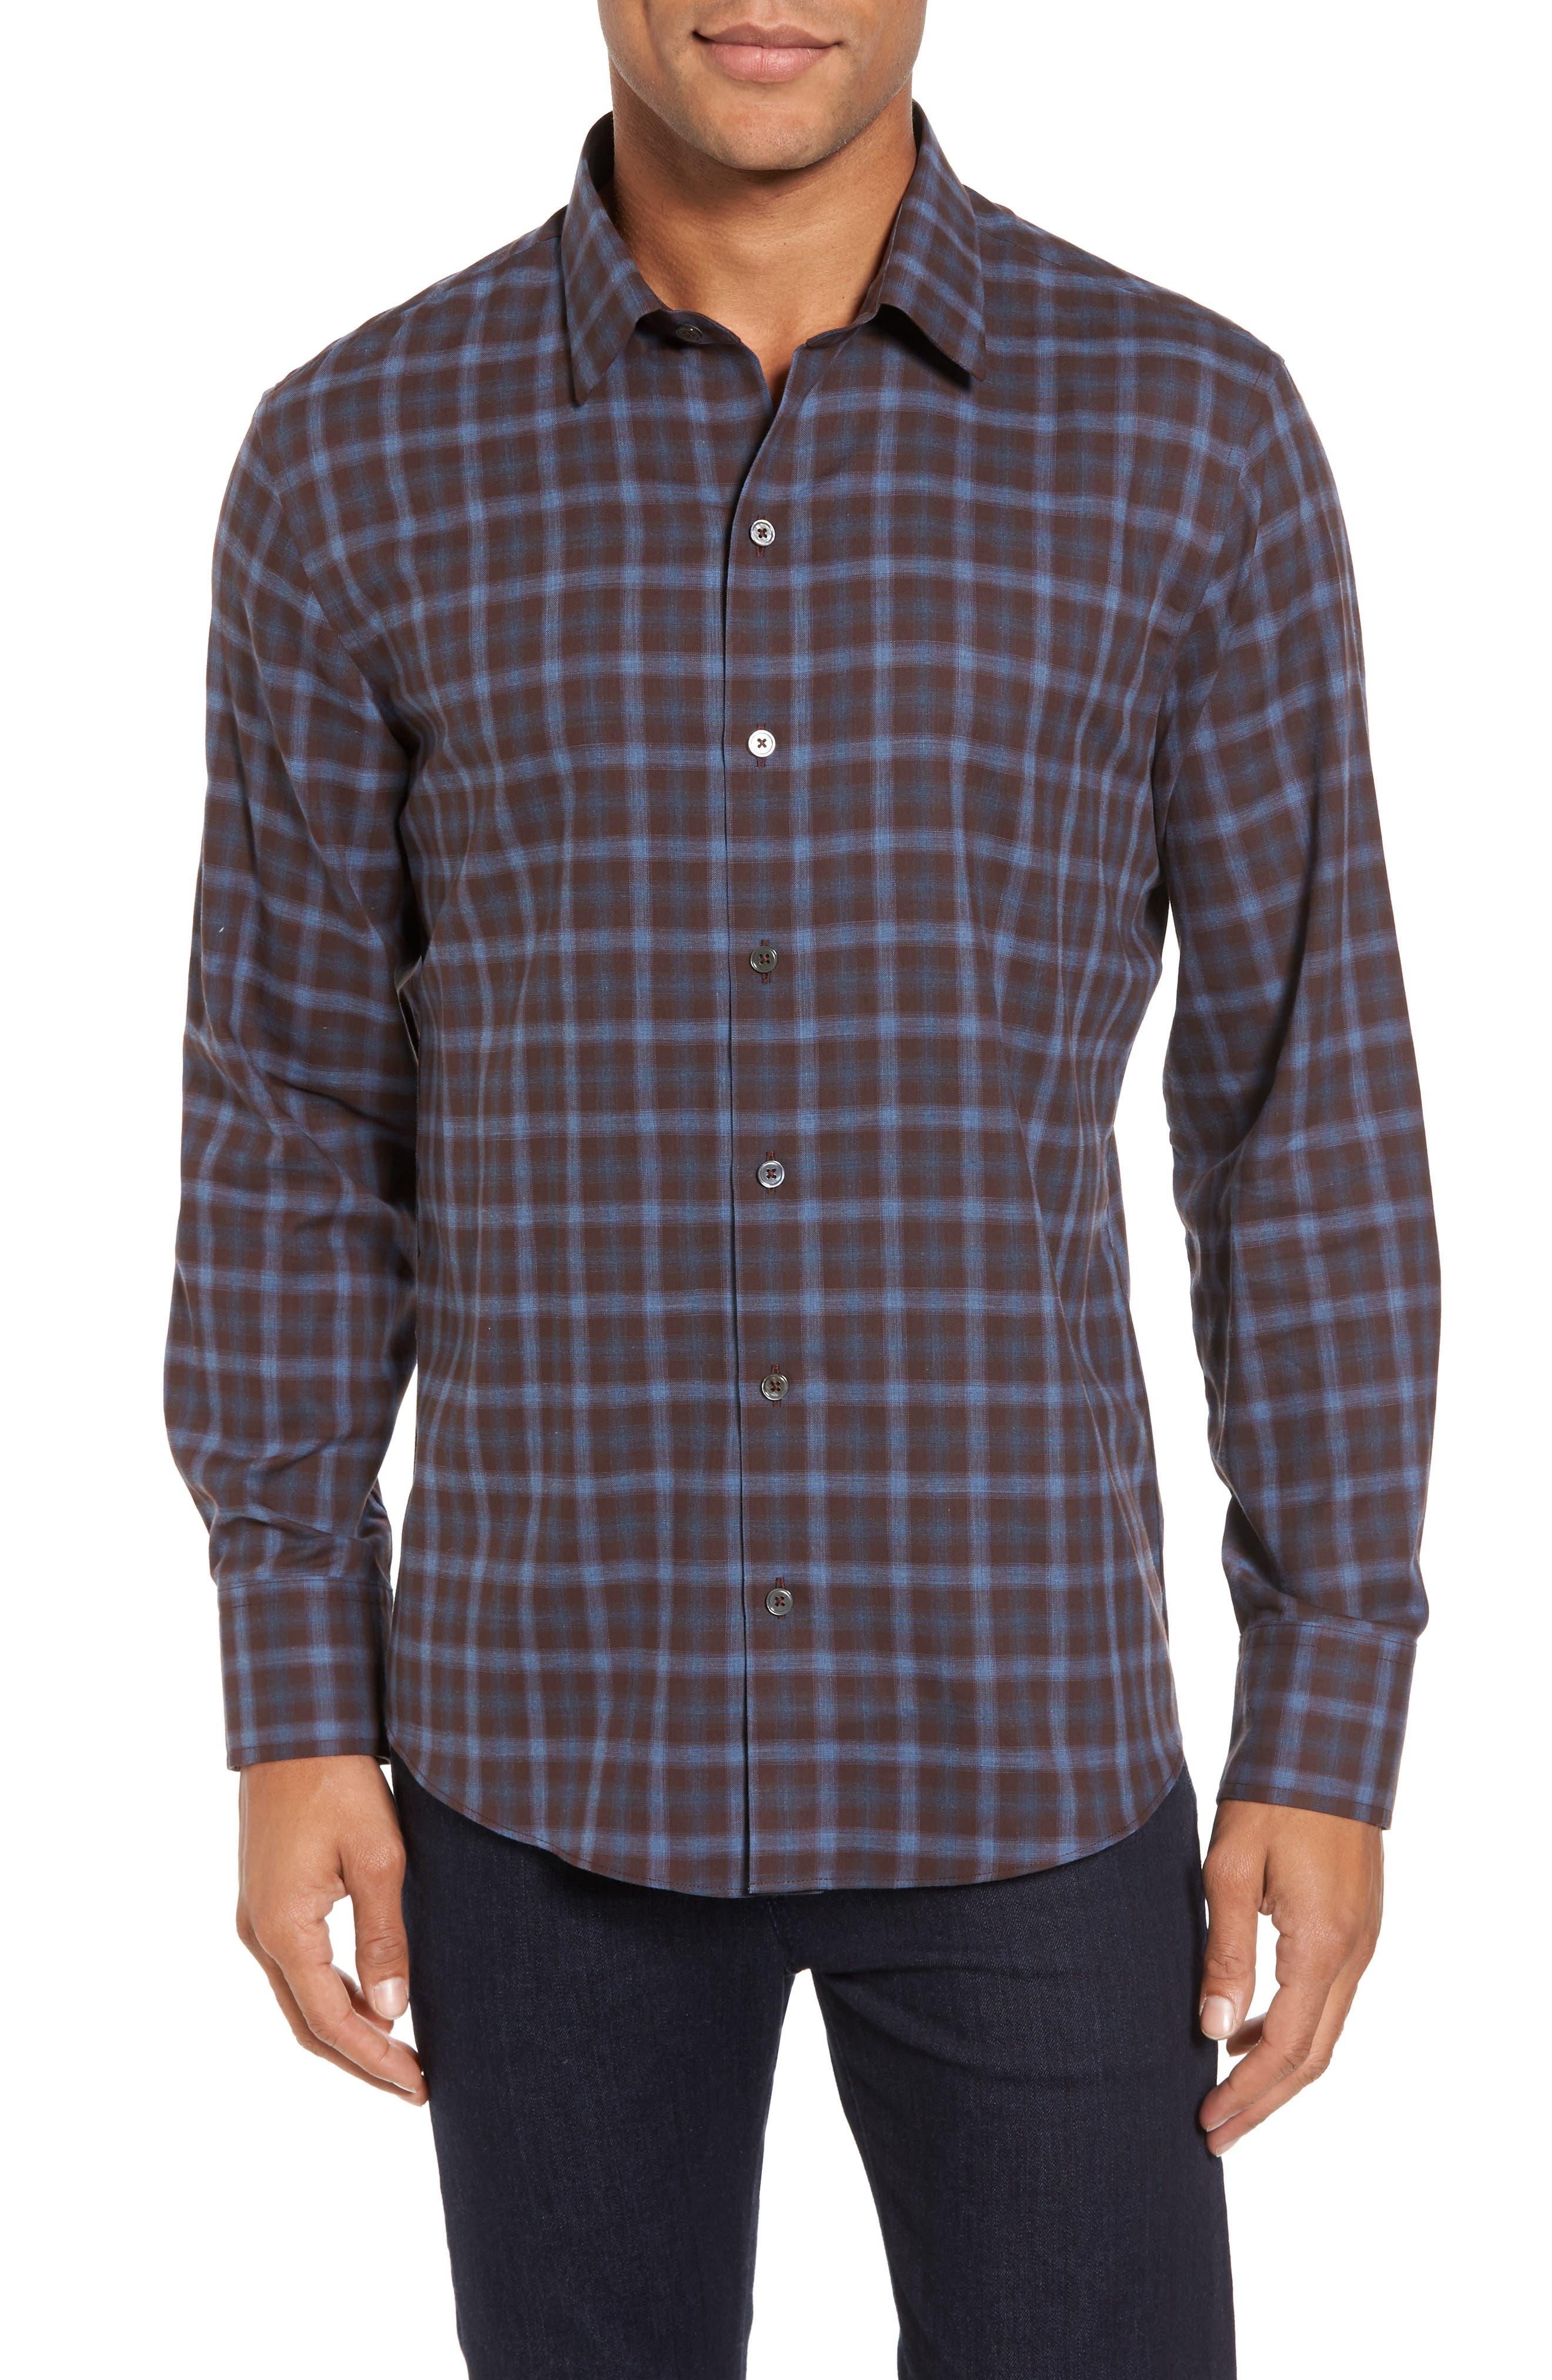 Fathollahi Slim Fit Plaid Sport Shirt,                             Main thumbnail 1, color,                             Brown